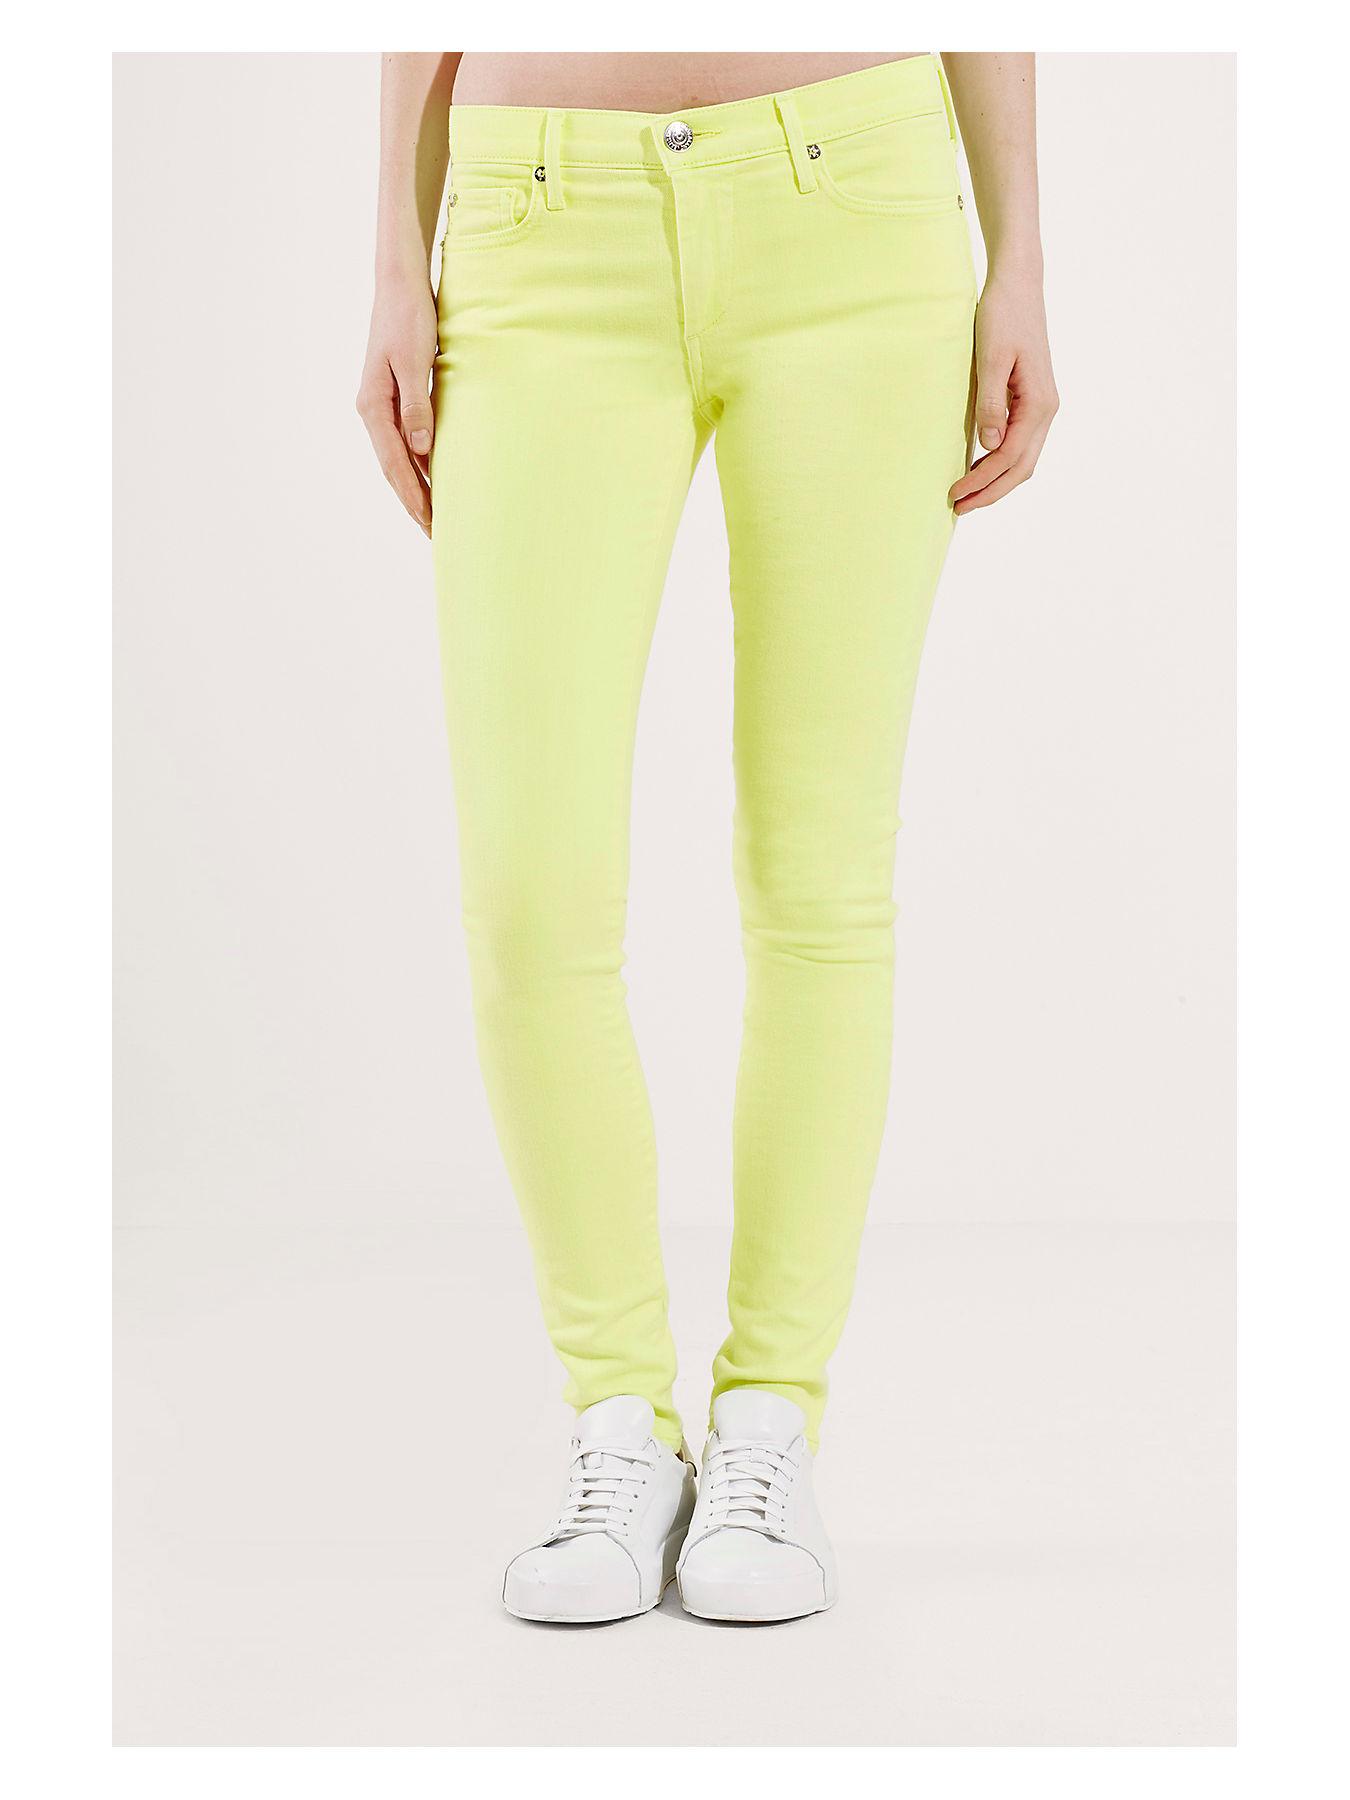 True Religion HALLE Jeans Skinny Fit khaki Damen Sale